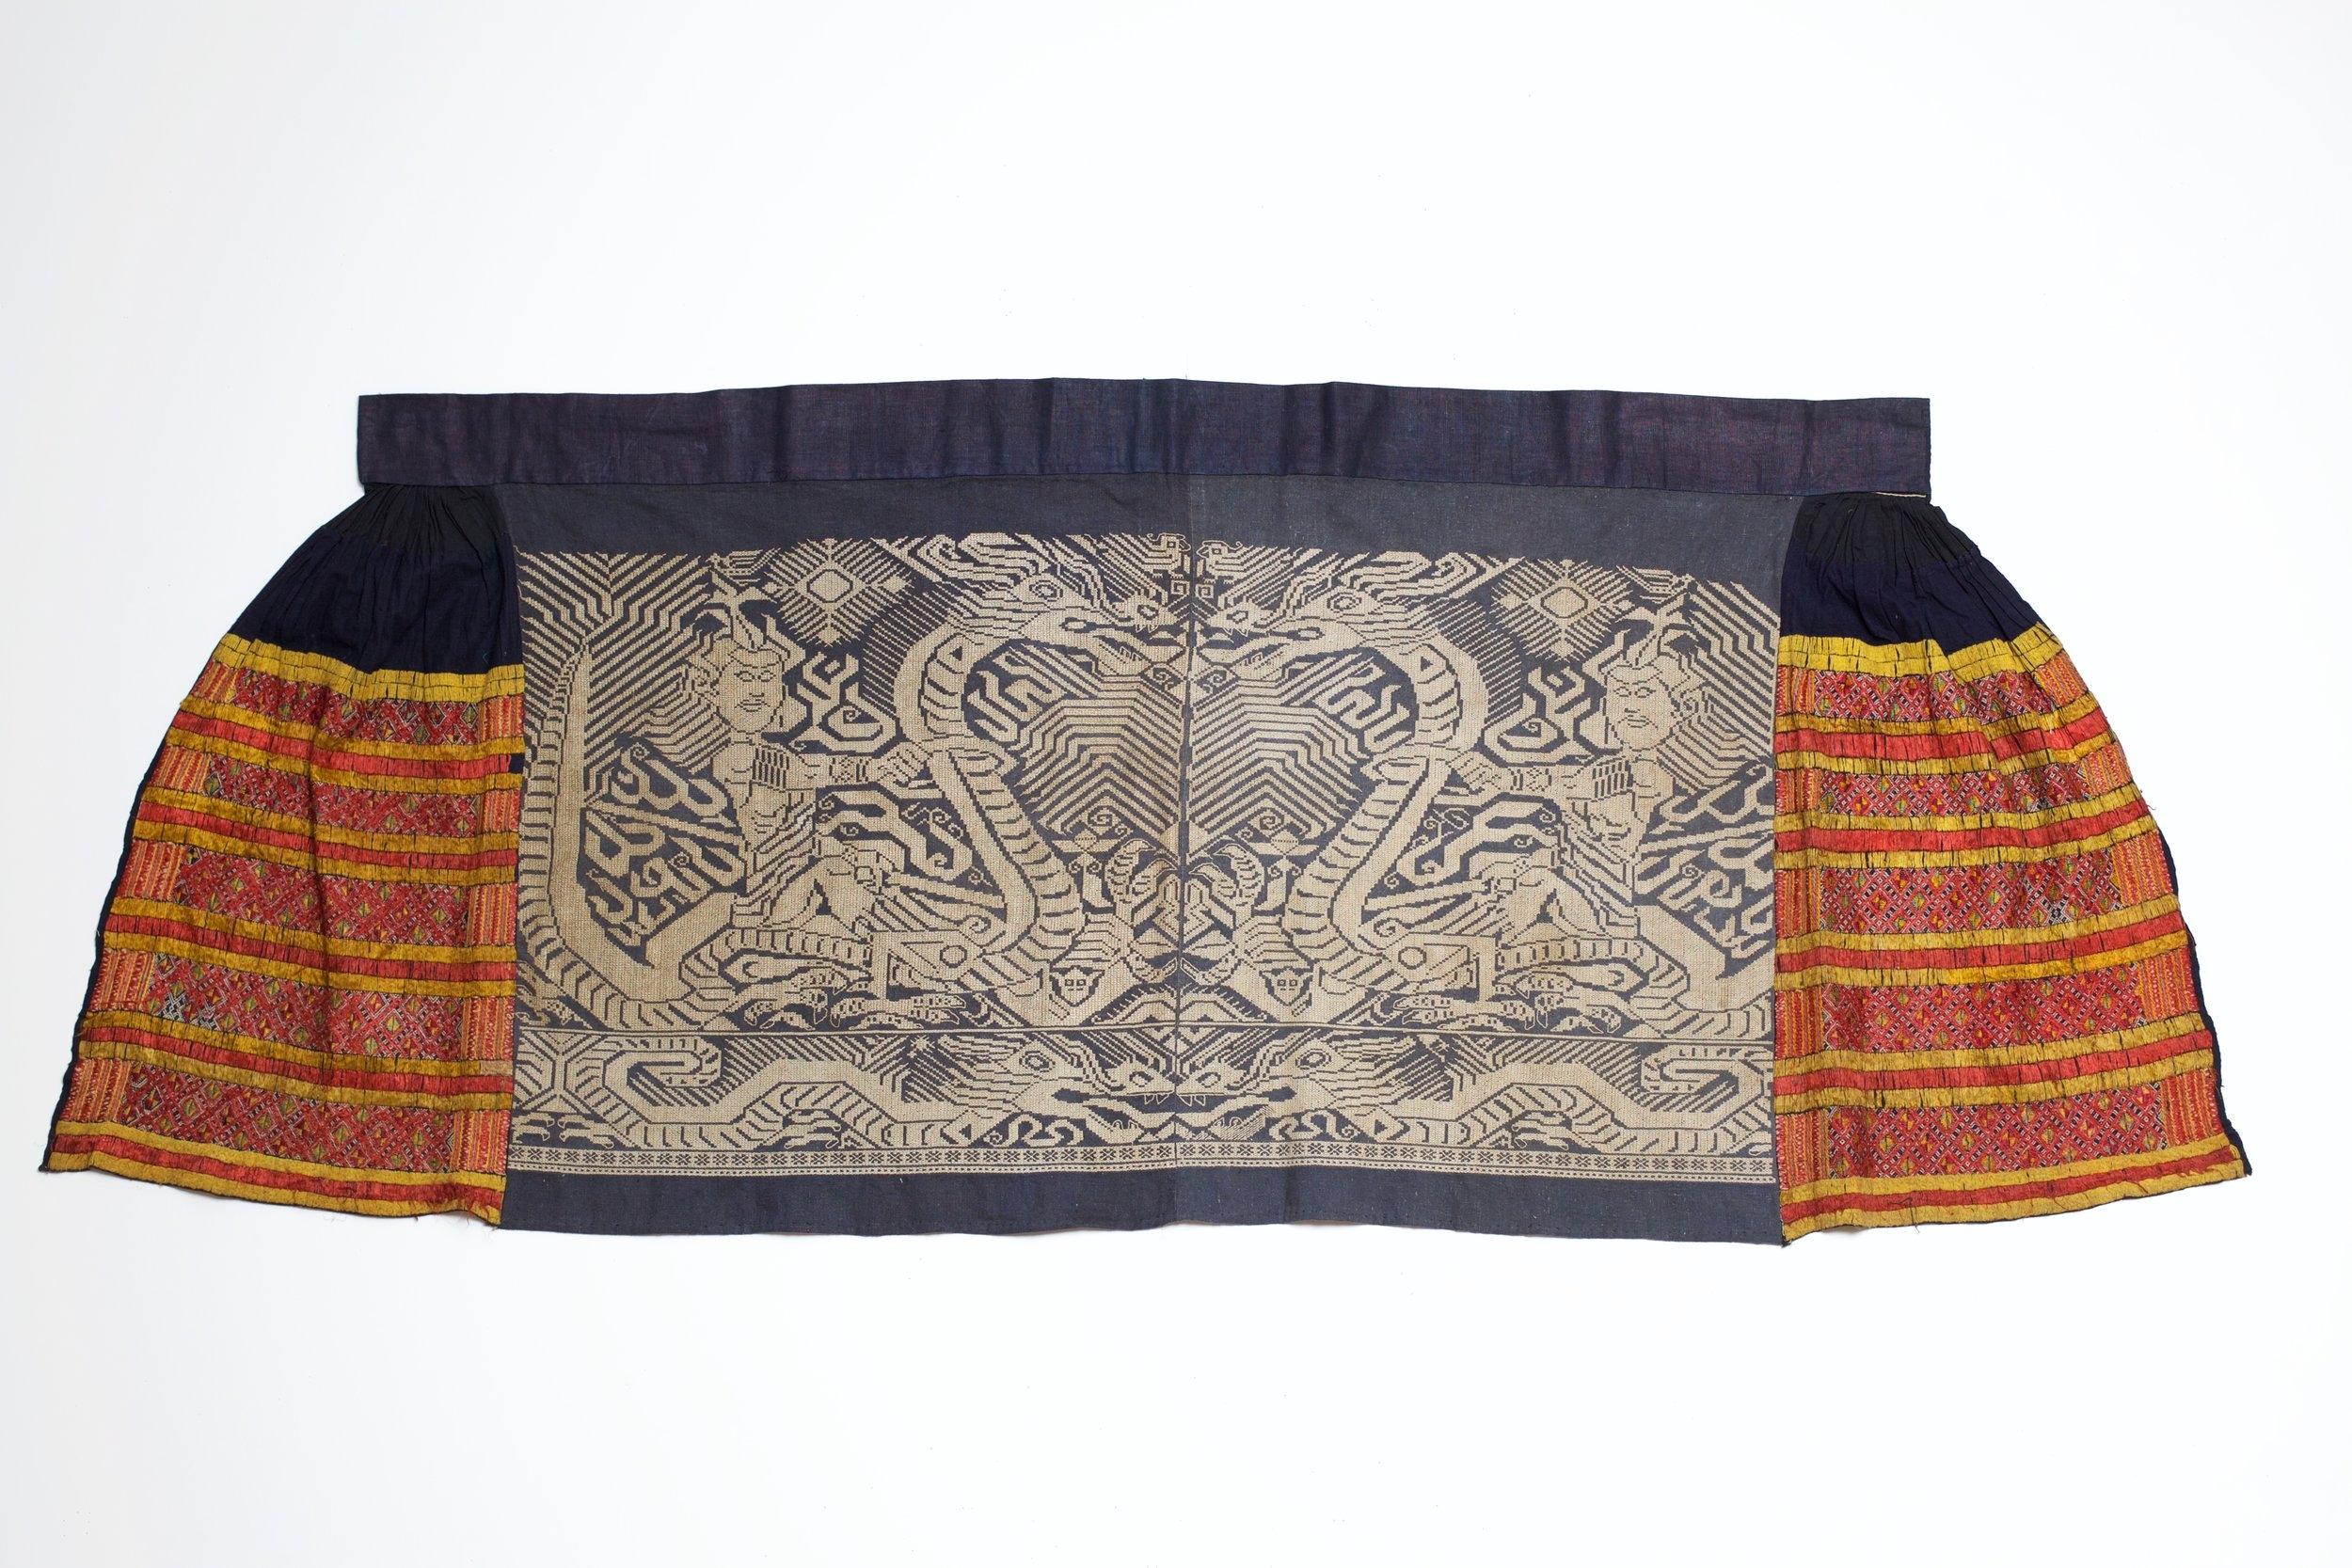 yeehao /Öl-Papier Wei/ßer Regenschirm China Traditionelle Tanzrequisiten Sonnenschirme Handgemachte Dekorationen Gr/ö/ße 52cm